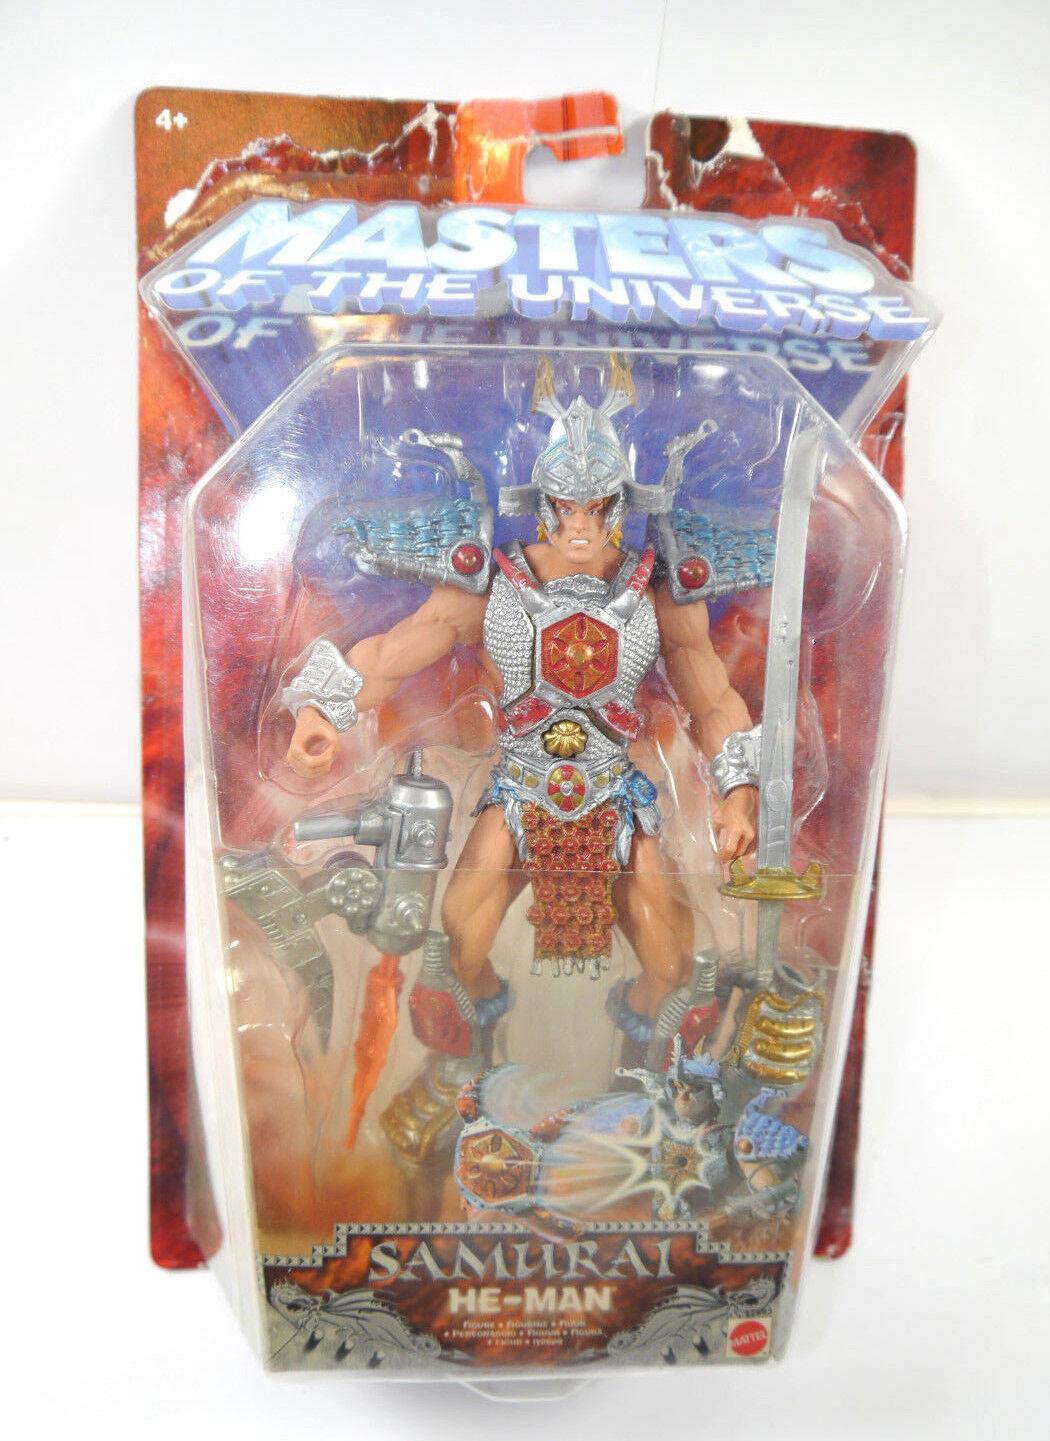 Maîtres de L'Univers Motu 57593 Samouraï He-Man Figurine D'Action Mattel Mattel Mattel 200X(L) dc8f33